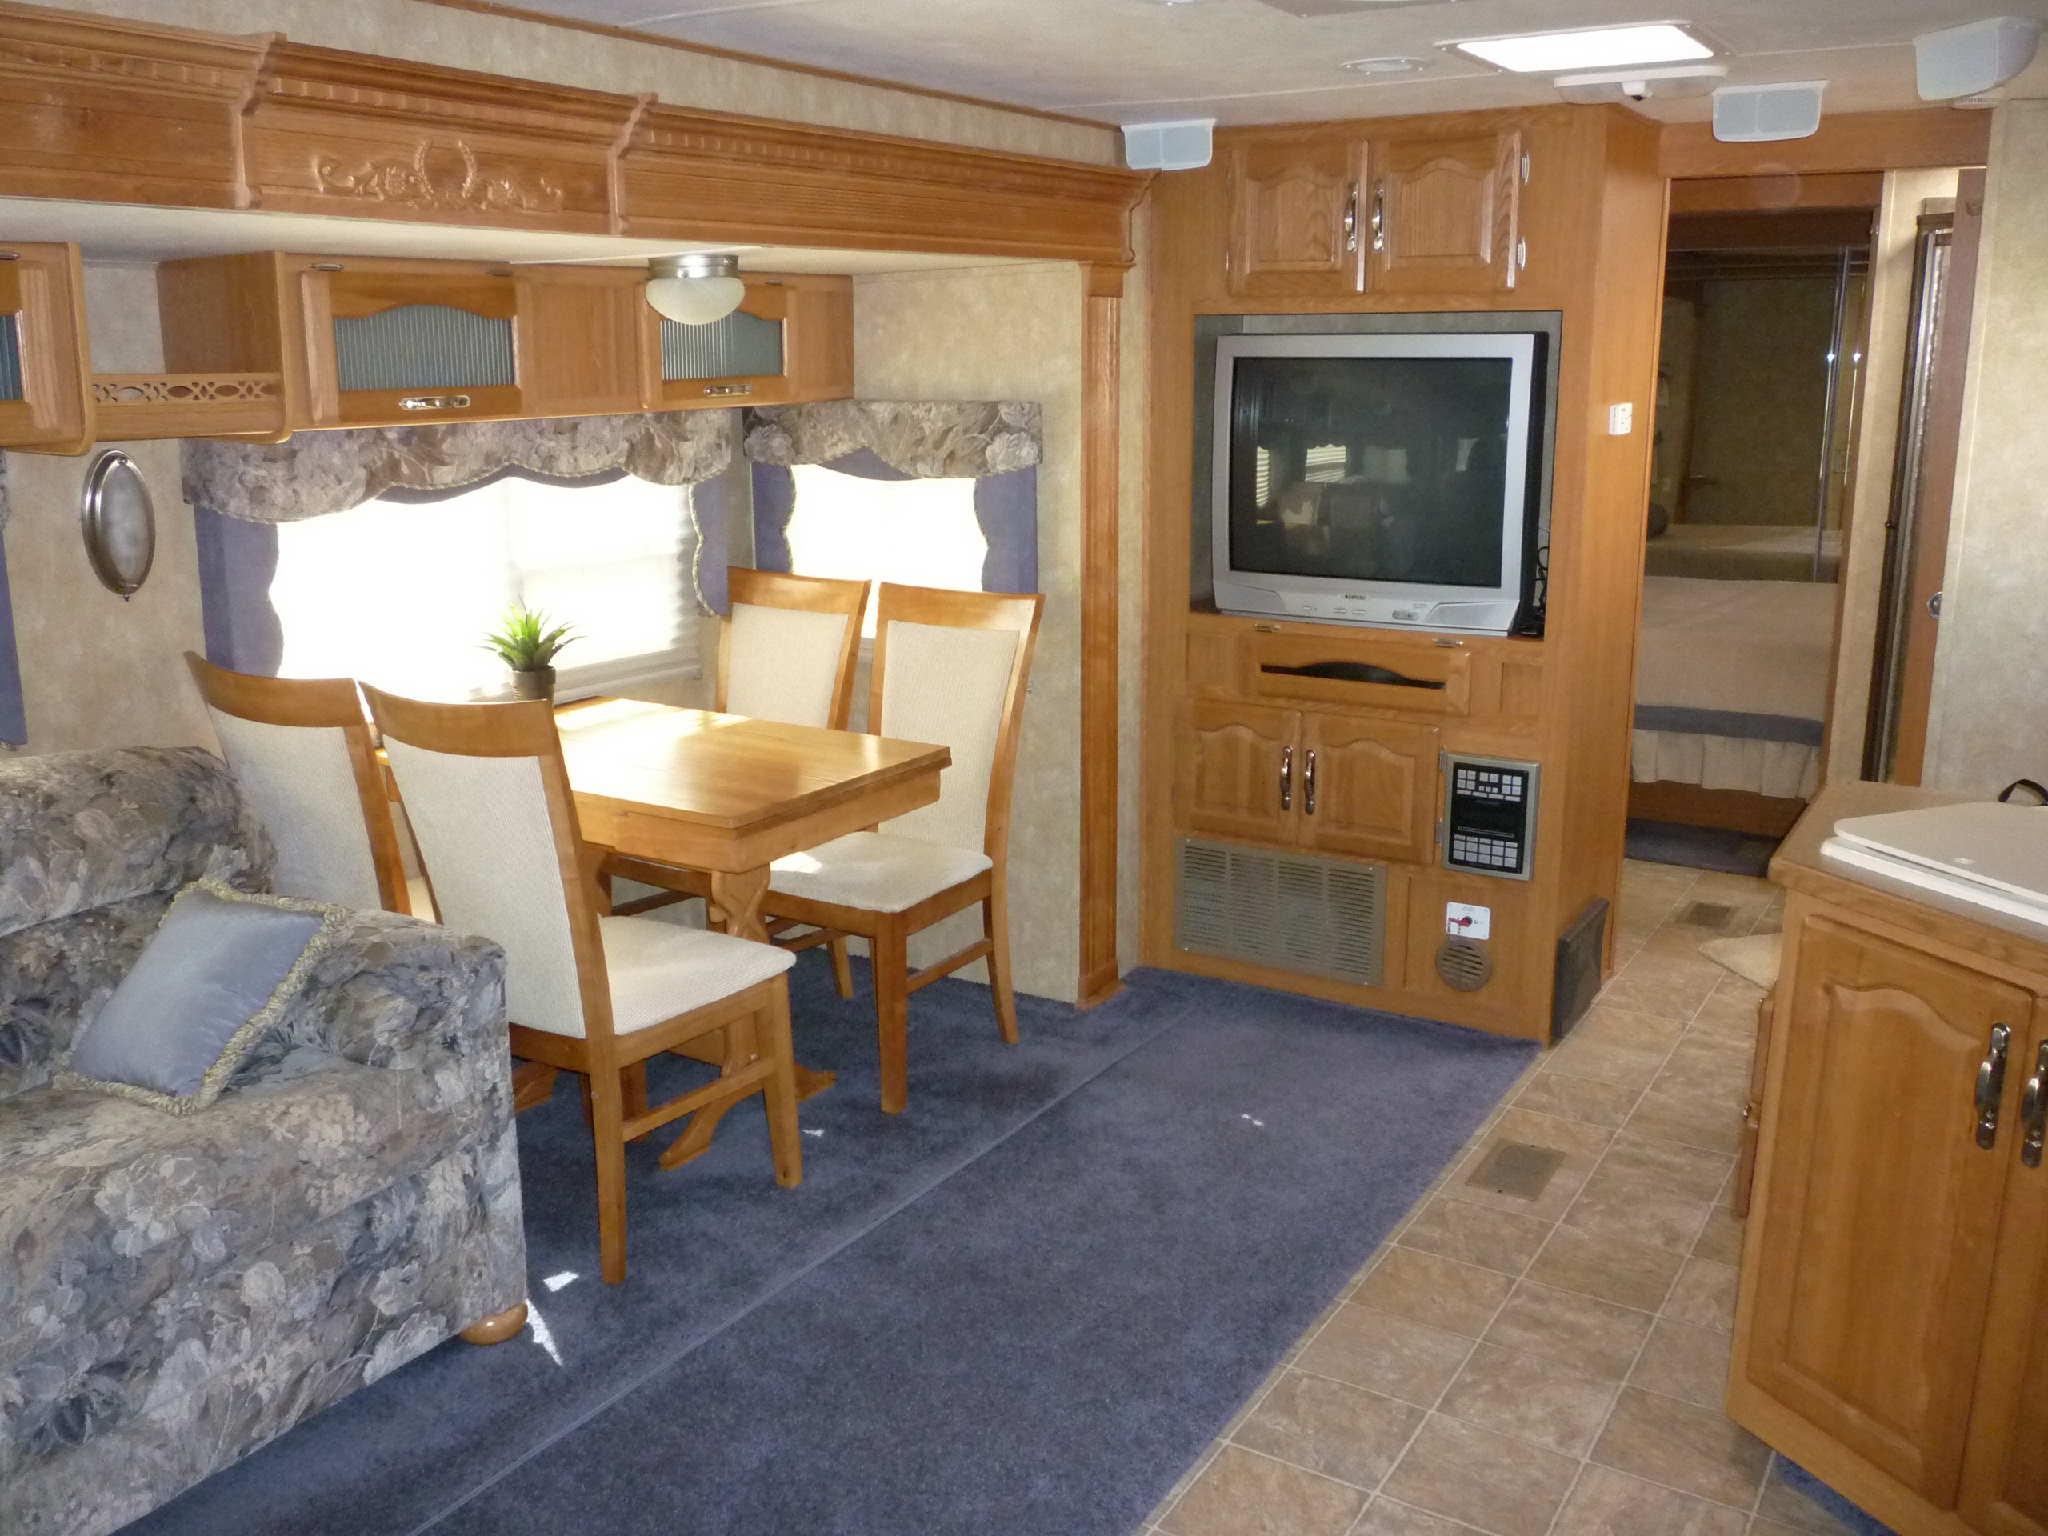 interieure de certaine caravane. Black Bedroom Furniture Sets. Home Design Ideas